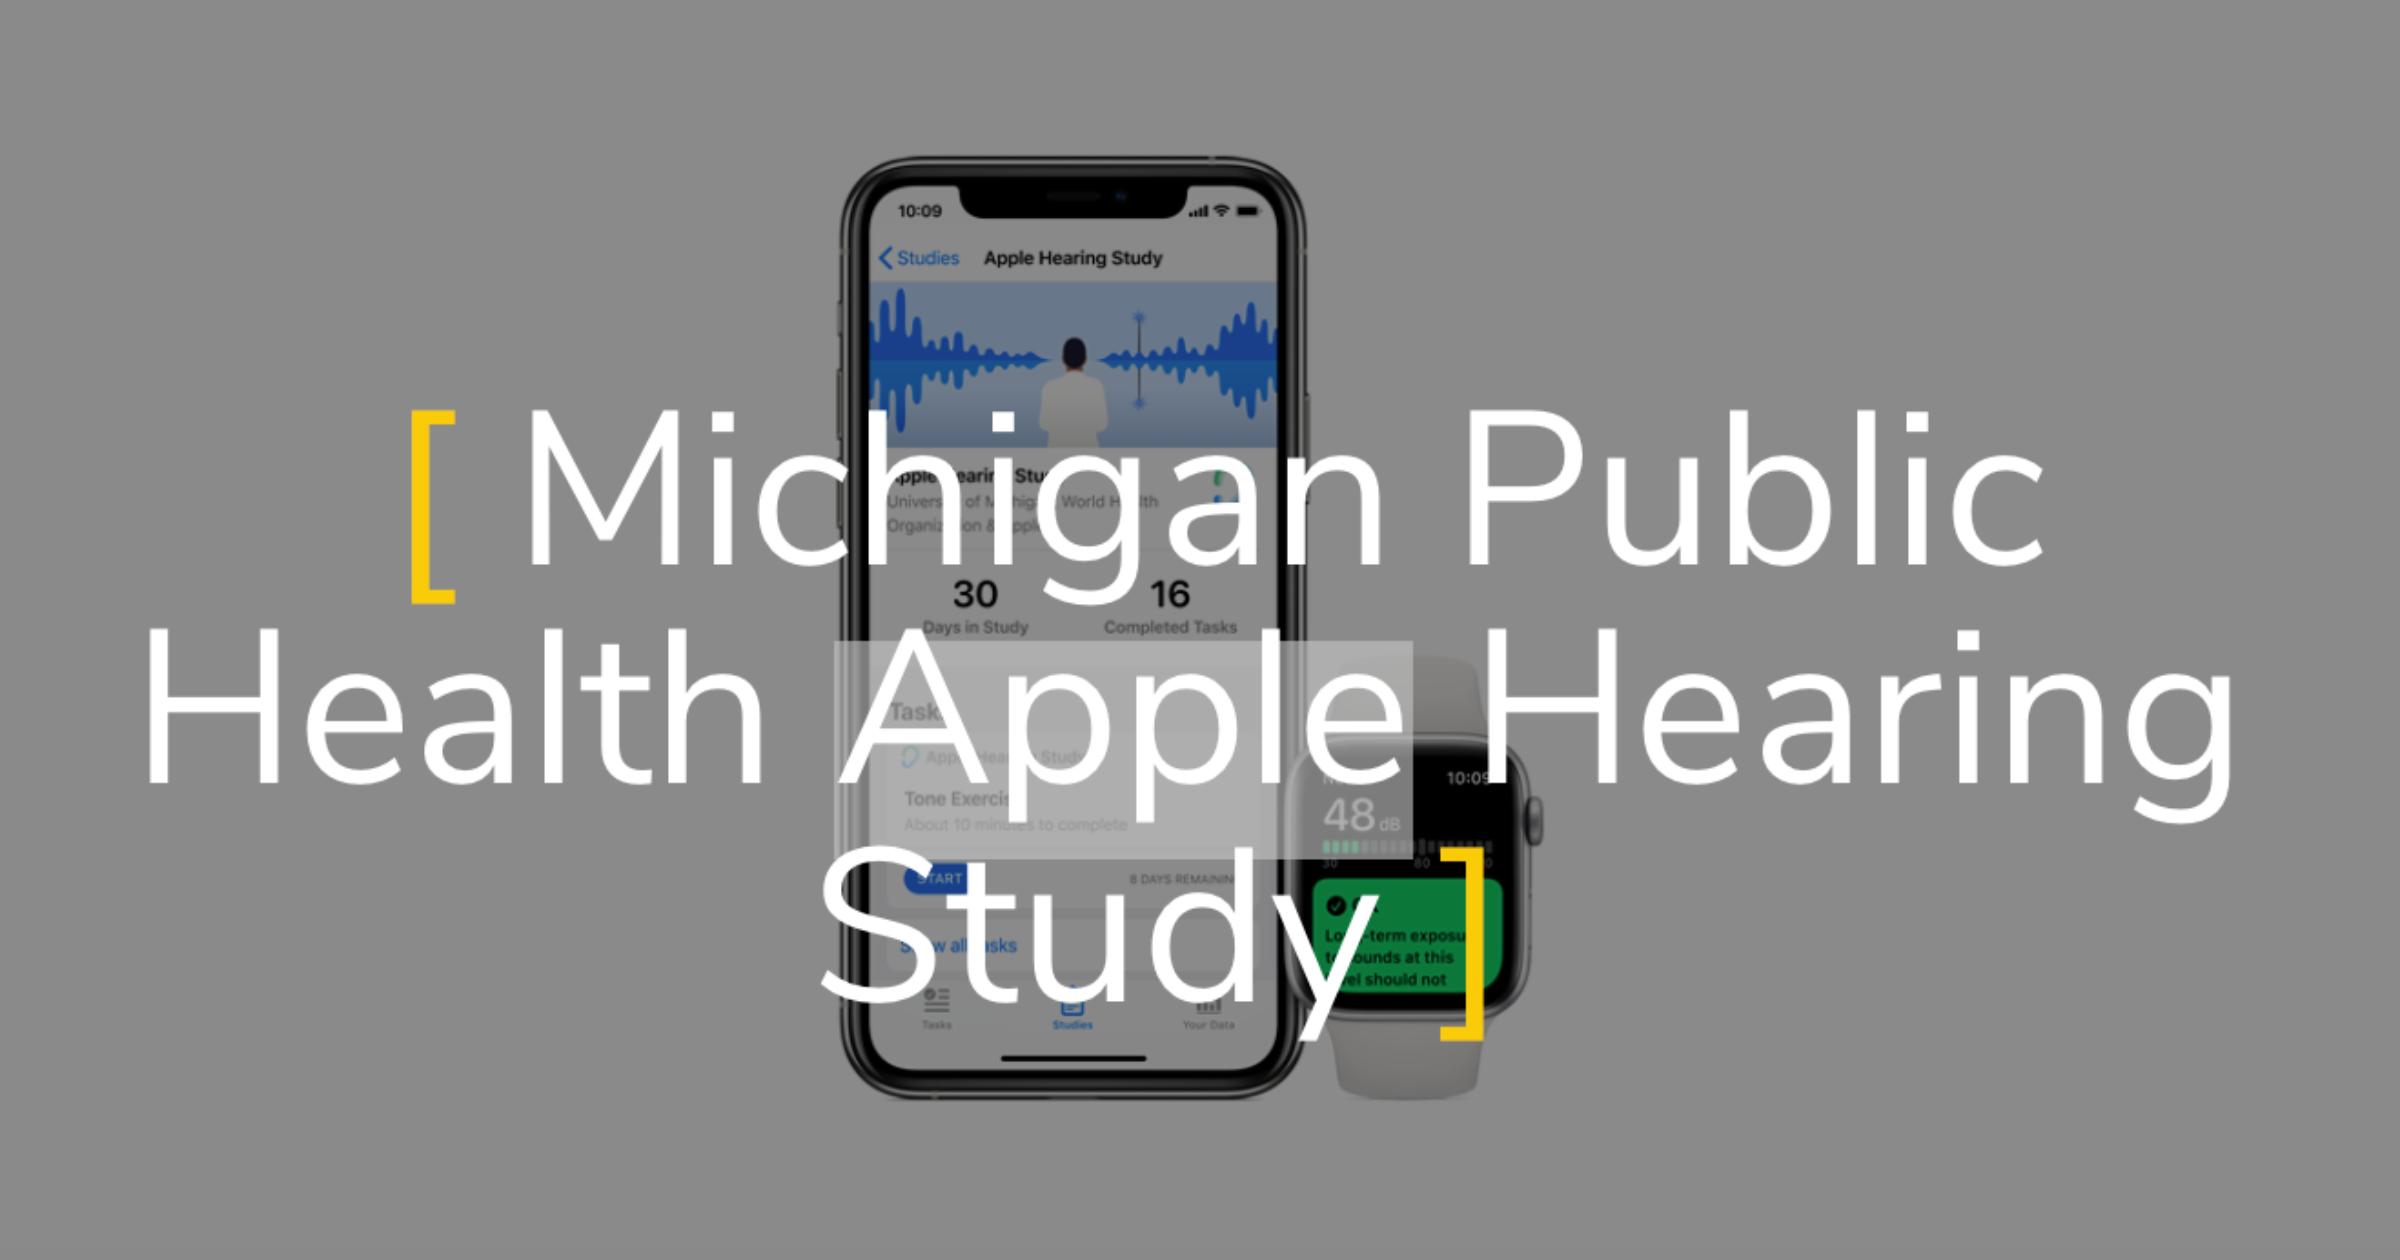 Michigan Public Health Apple Hearing Study